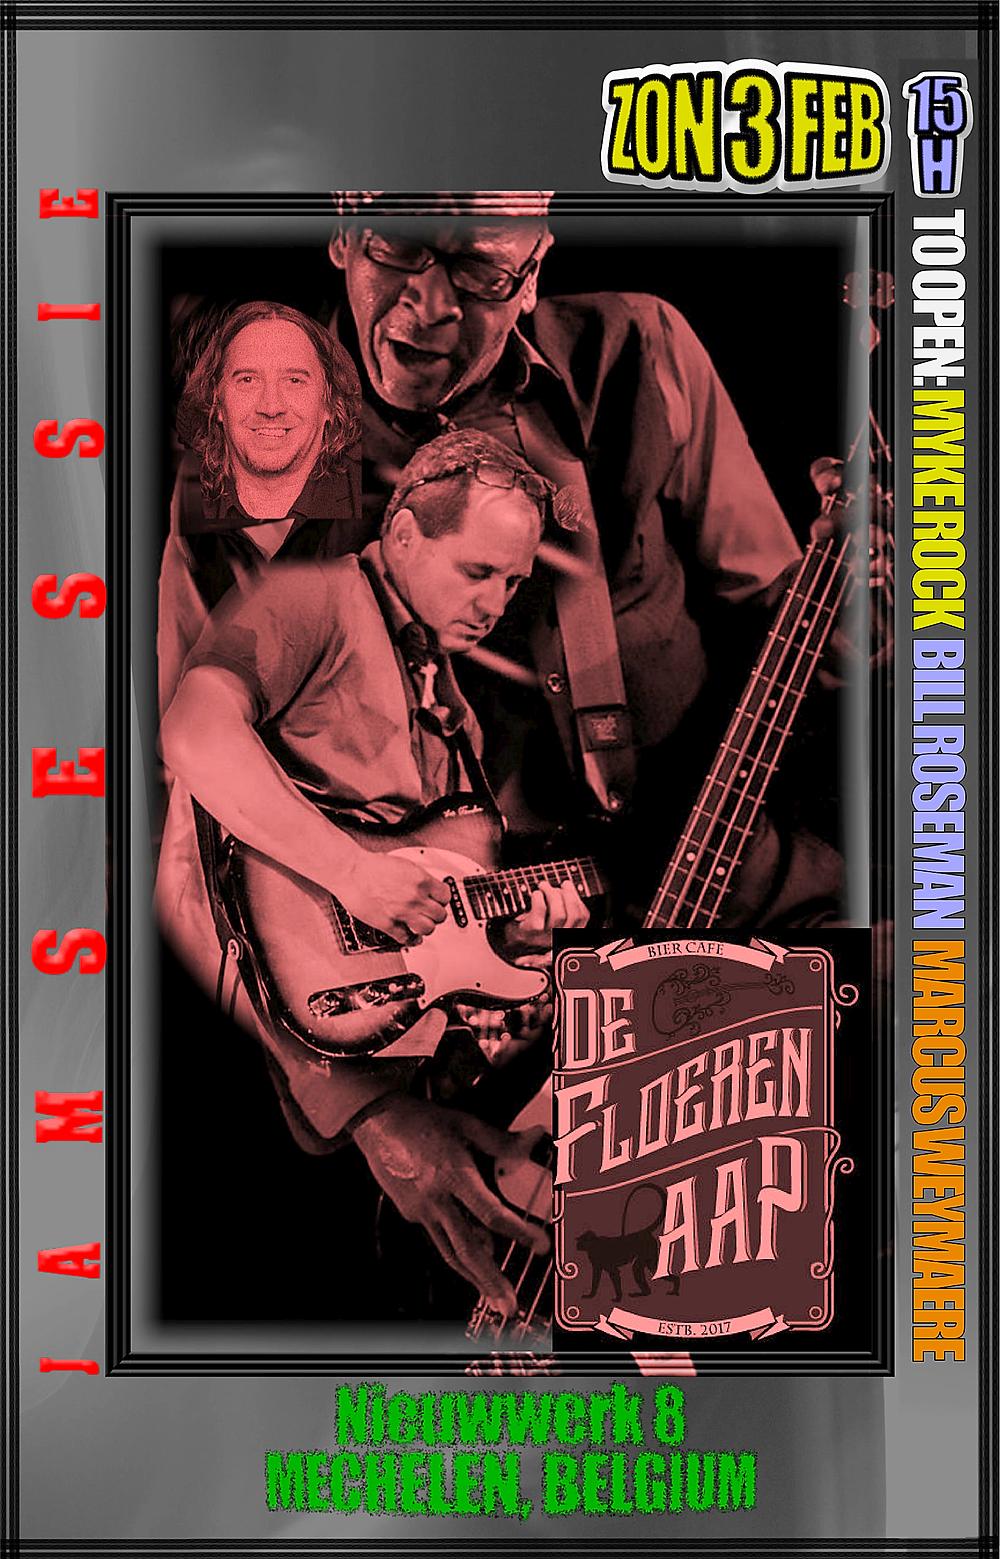 Myke Rock, Marcus Weymaere & Bill Rosmean Open the Jamsessie at De Floeren Aap Zon 3 Feb!